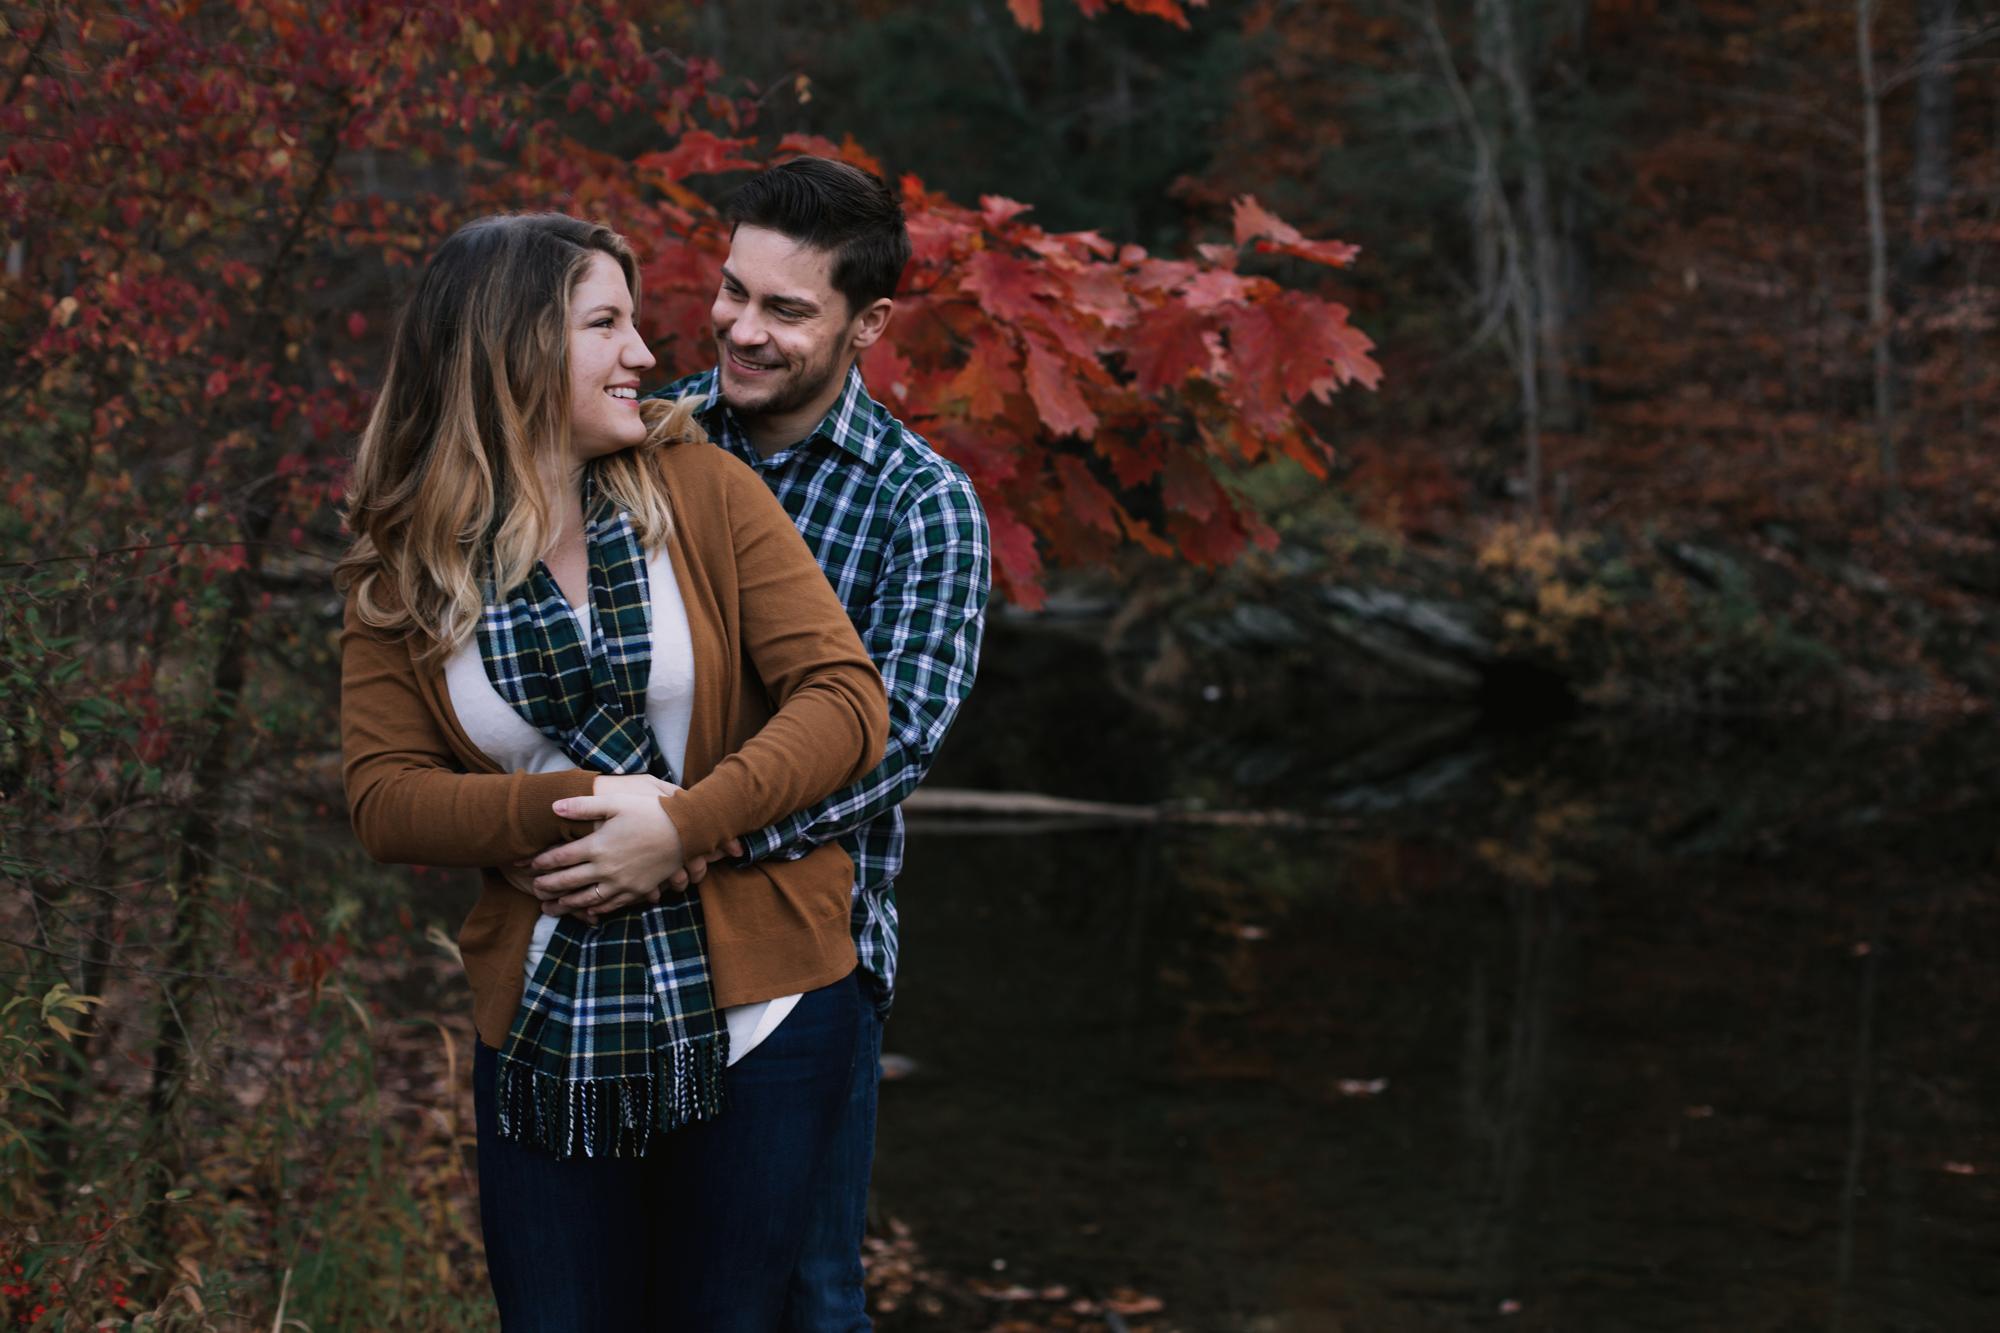 lehigh-valley-photographer-couples-session-jacobsburg-park